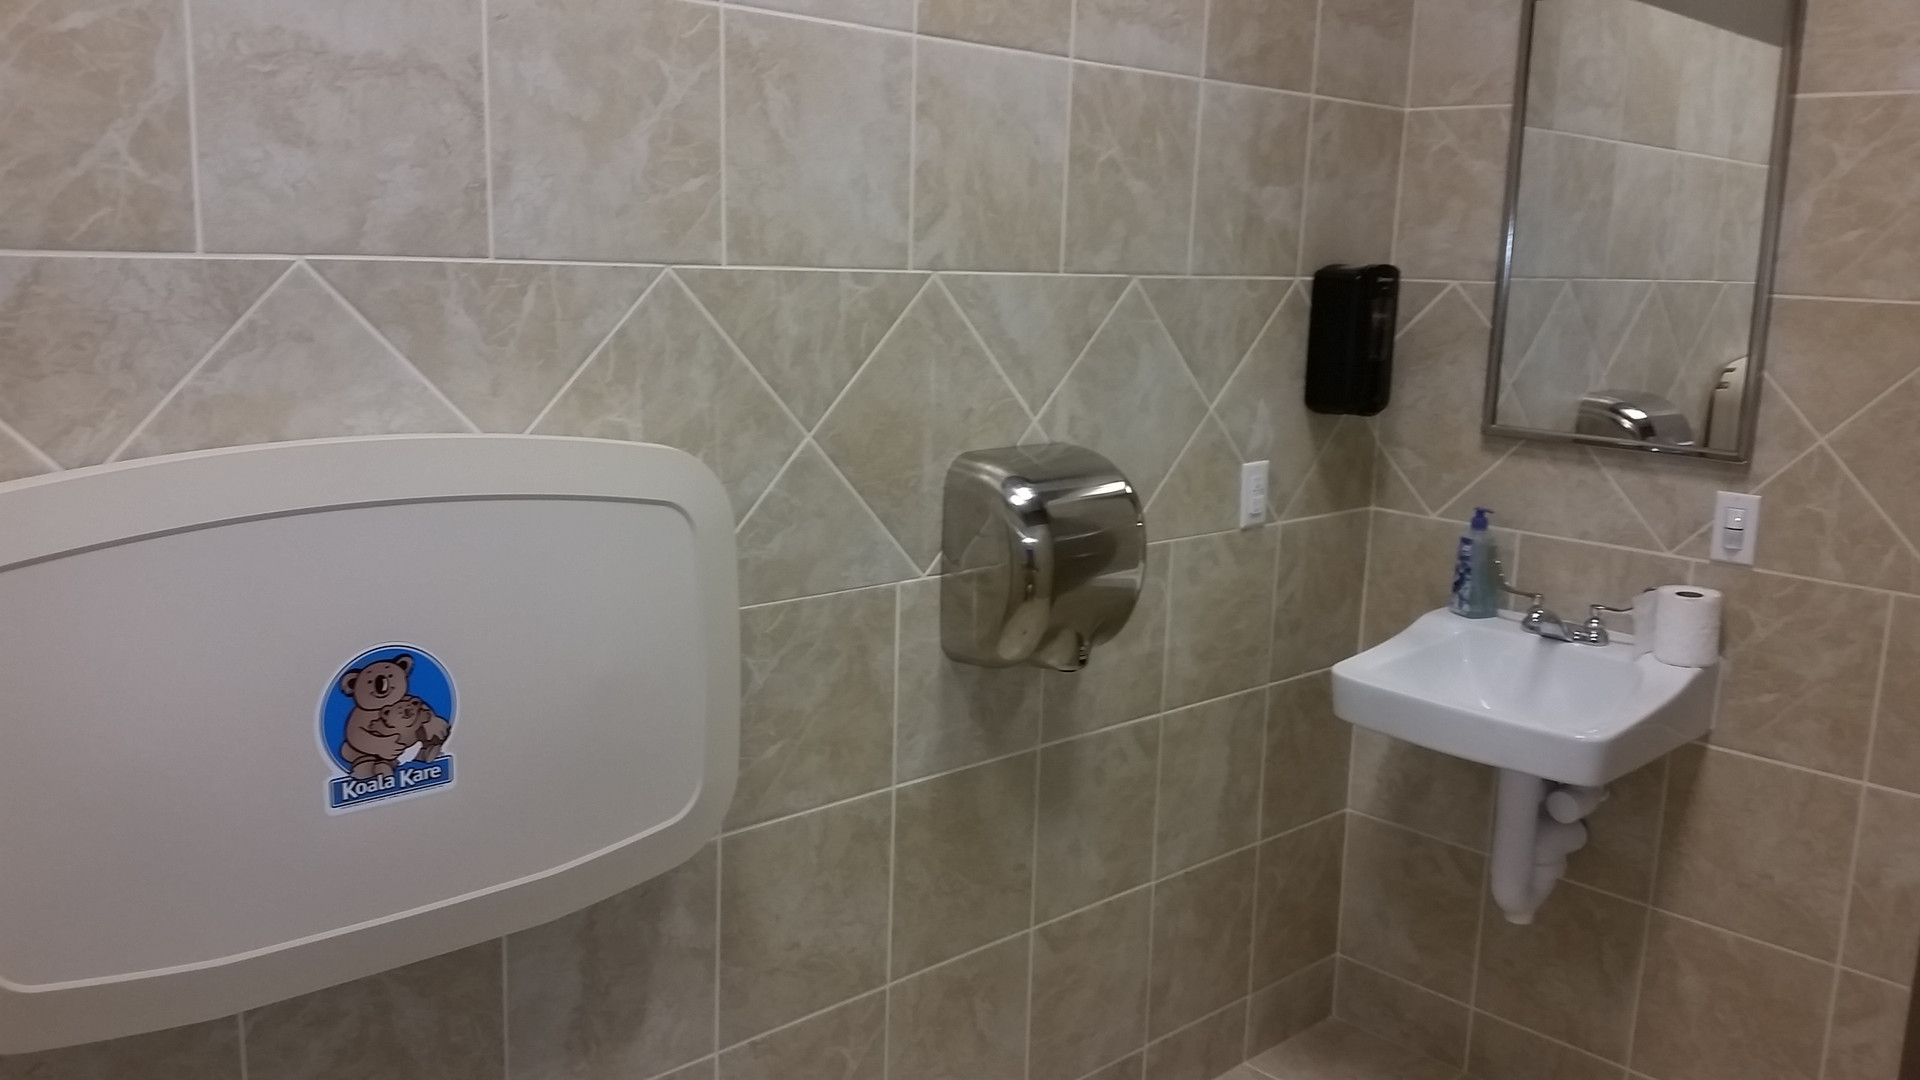 Diaper Changer, Sink & Hand-dryer - Buildout Pros